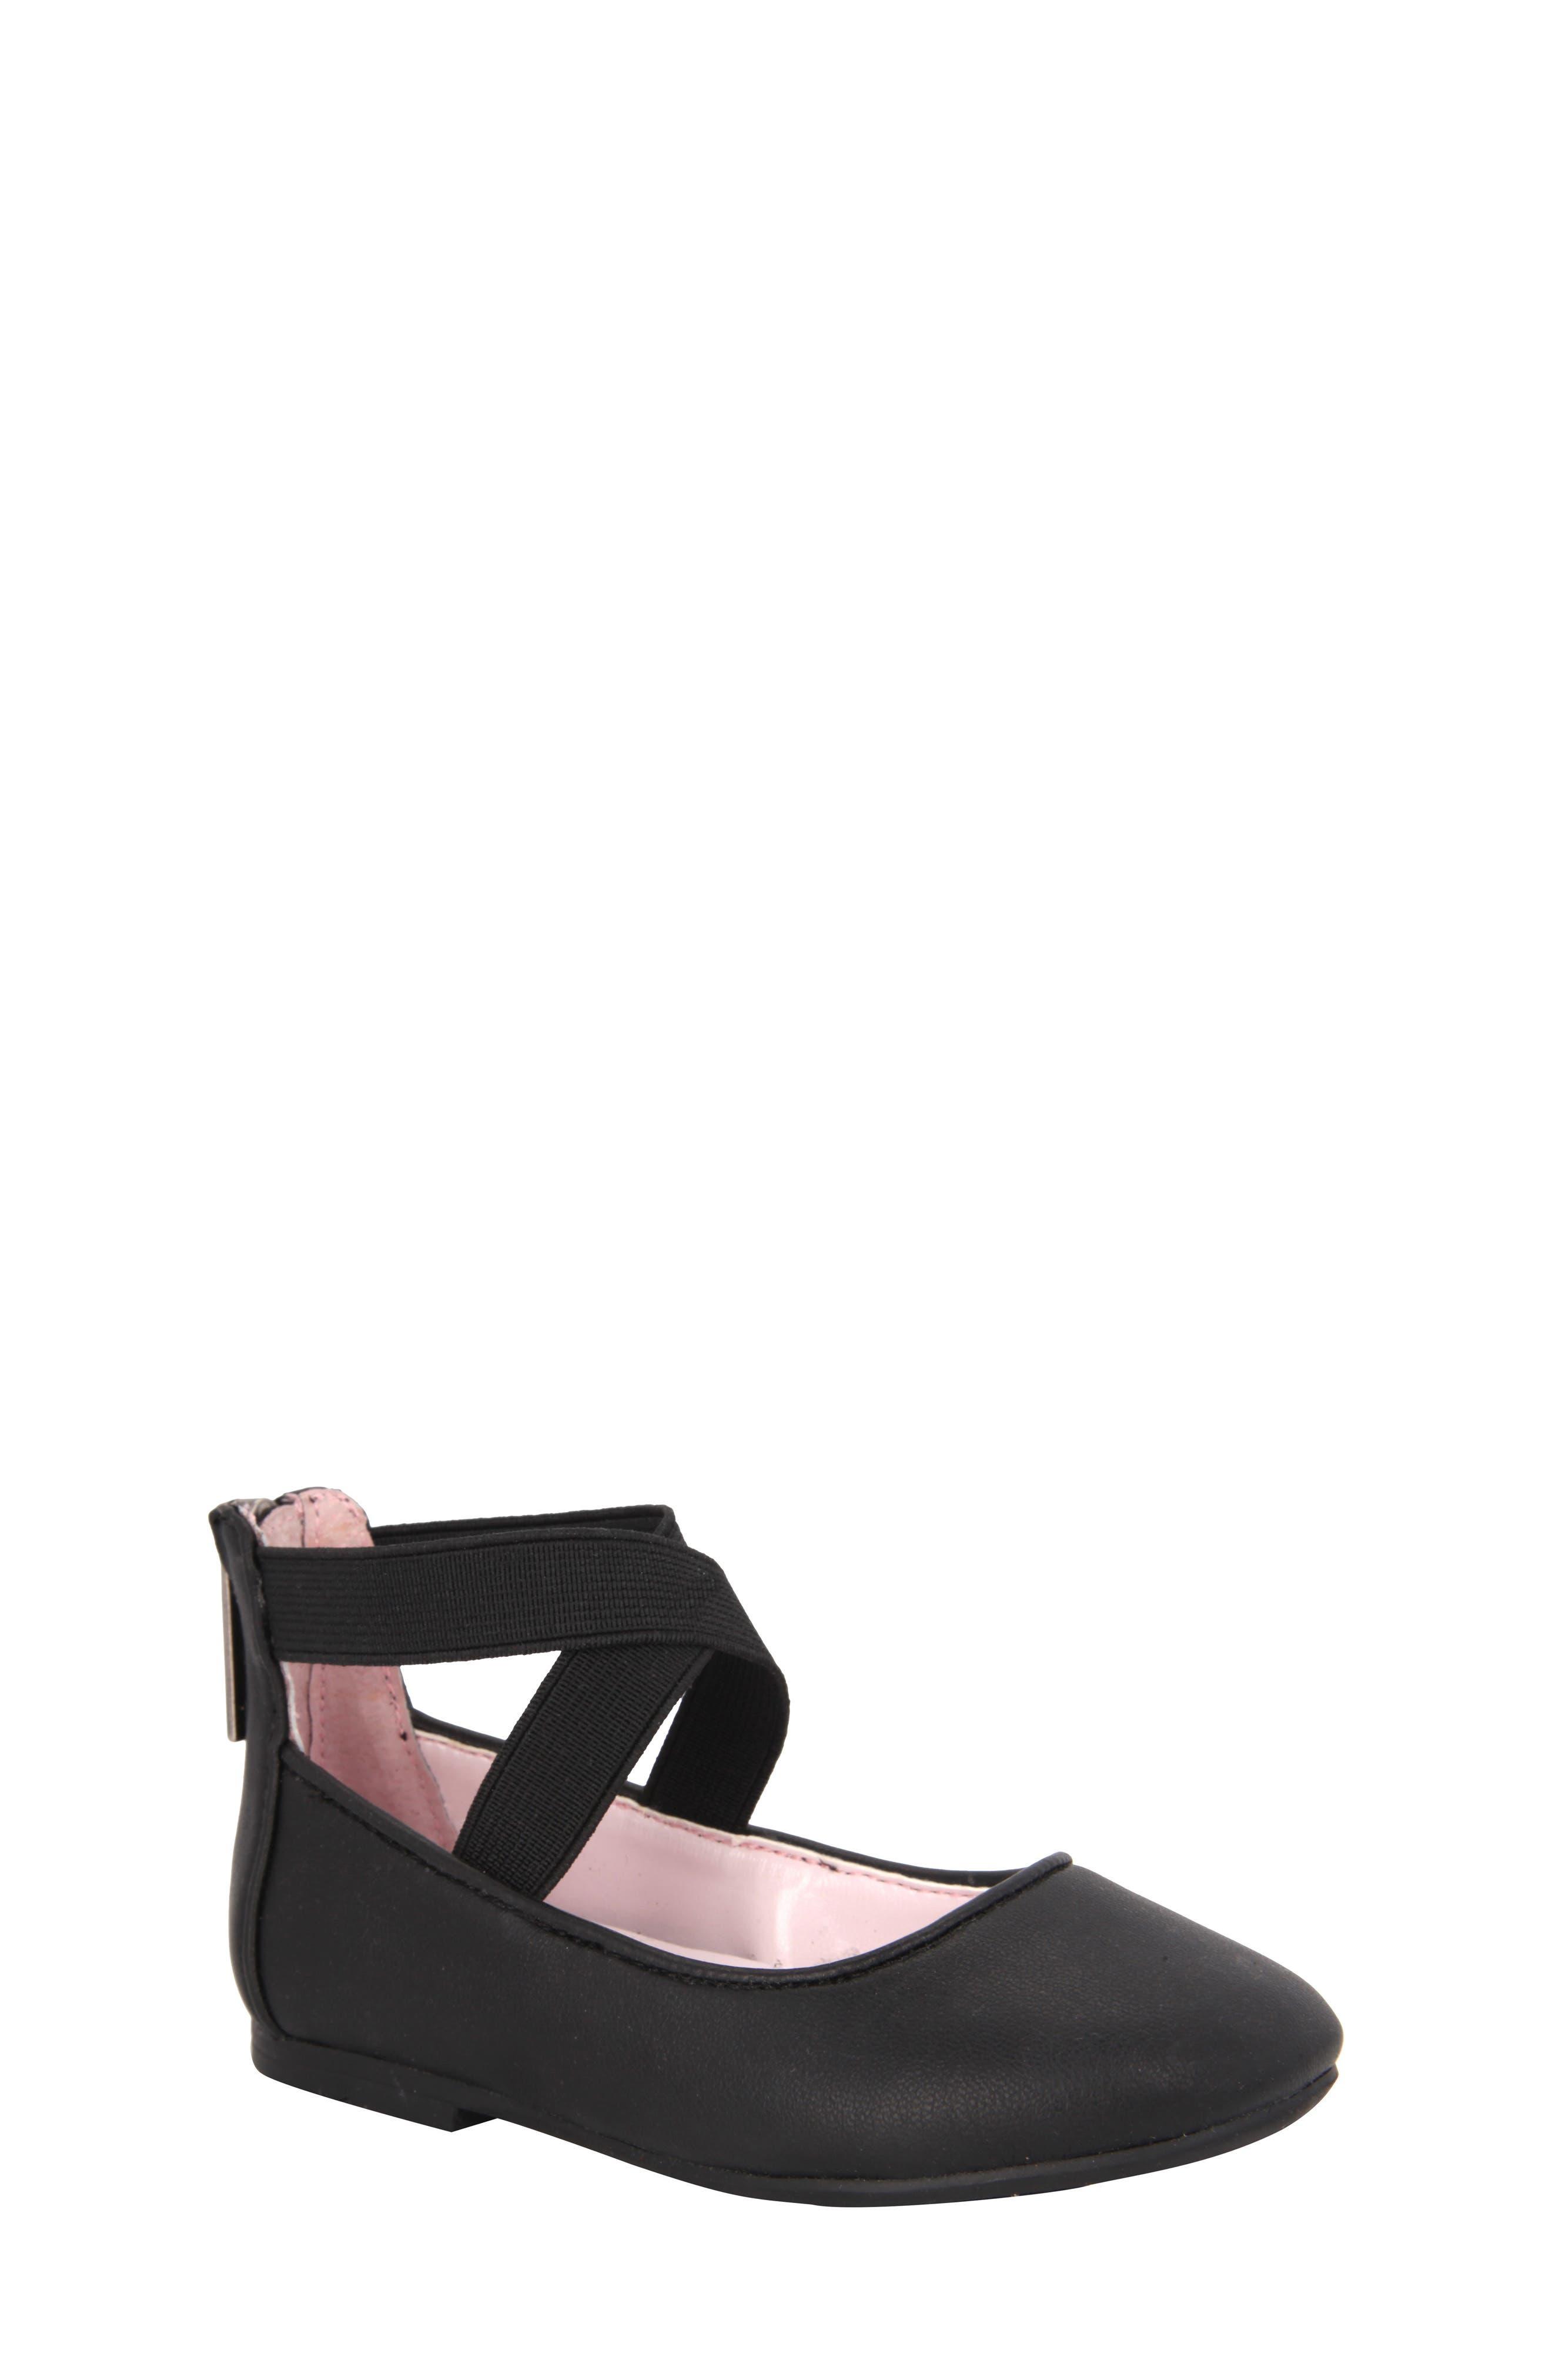 Marissa Cross Strap Flat,                             Main thumbnail 1, color,                             Black Faux Leather